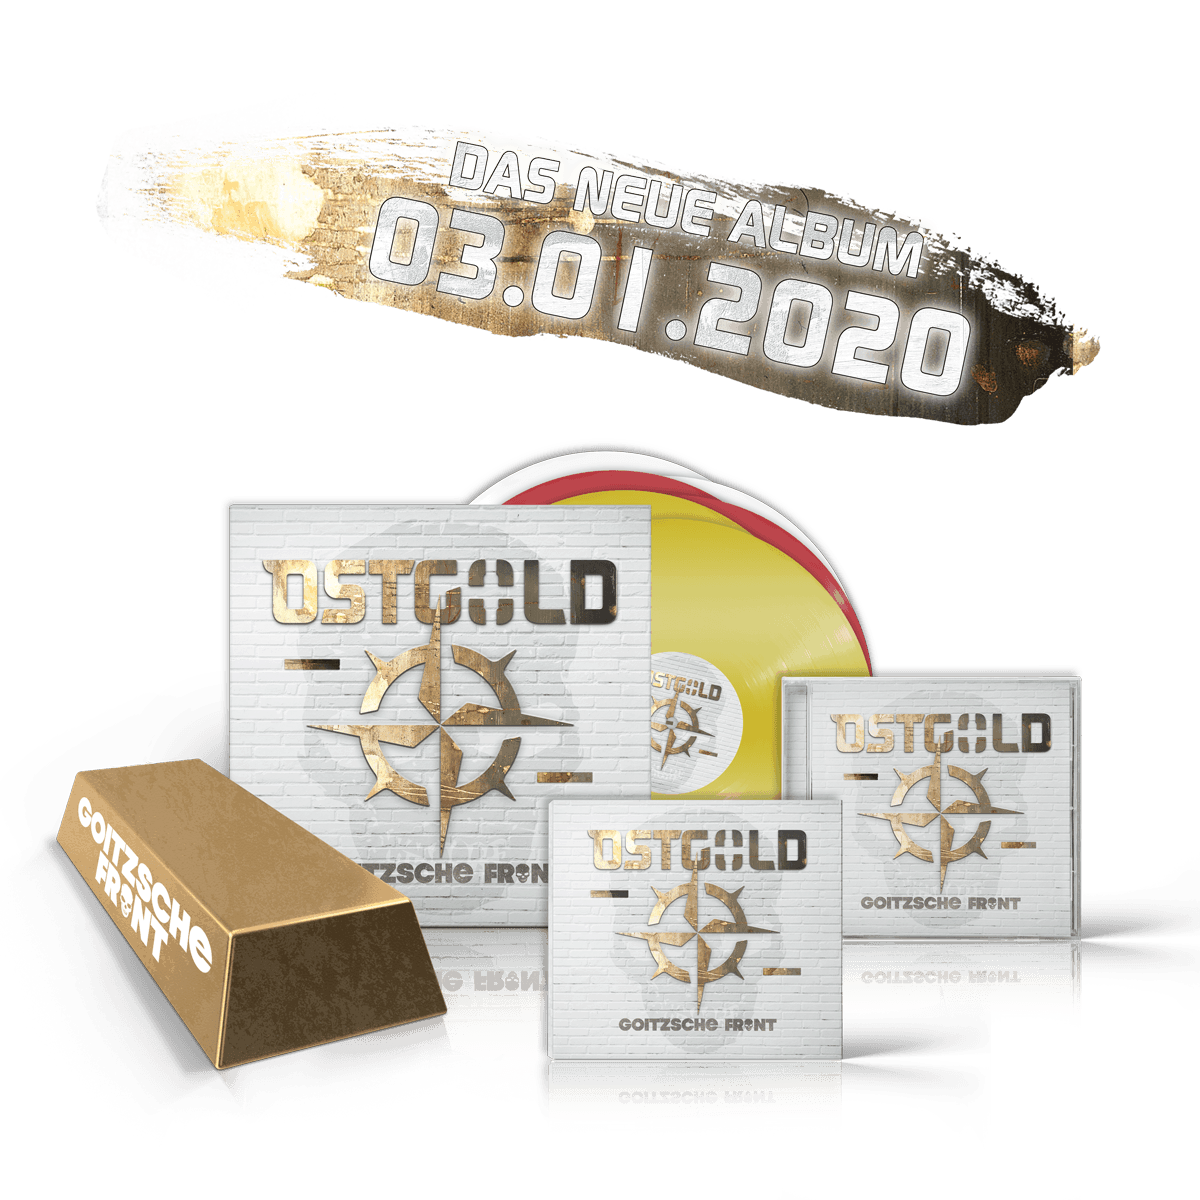 ostgold-all-mockup-final